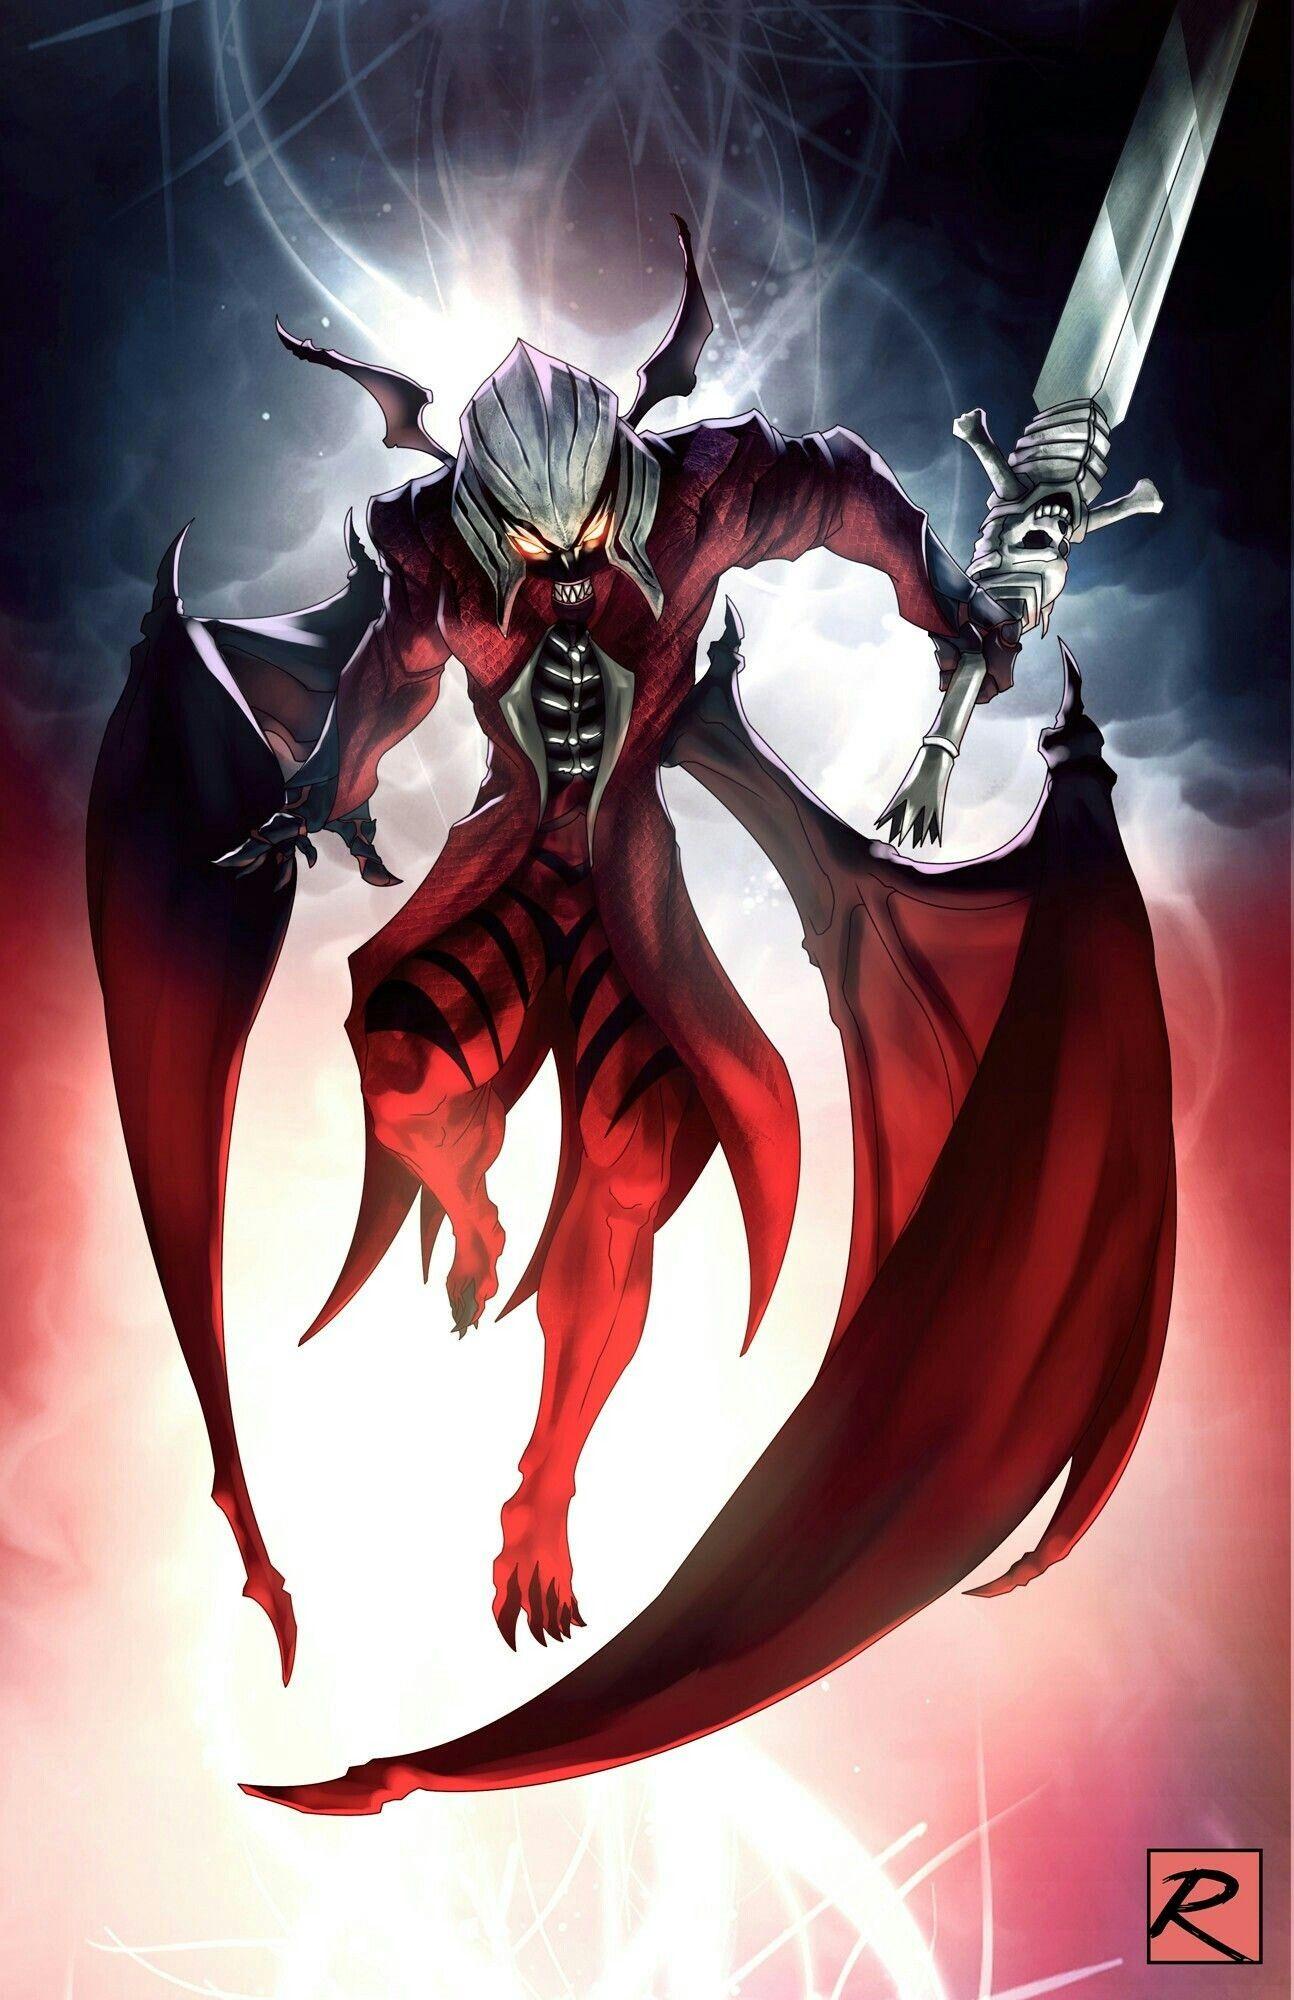 Dante Devil Trigger Devil May Cry Dante Devil May Cry